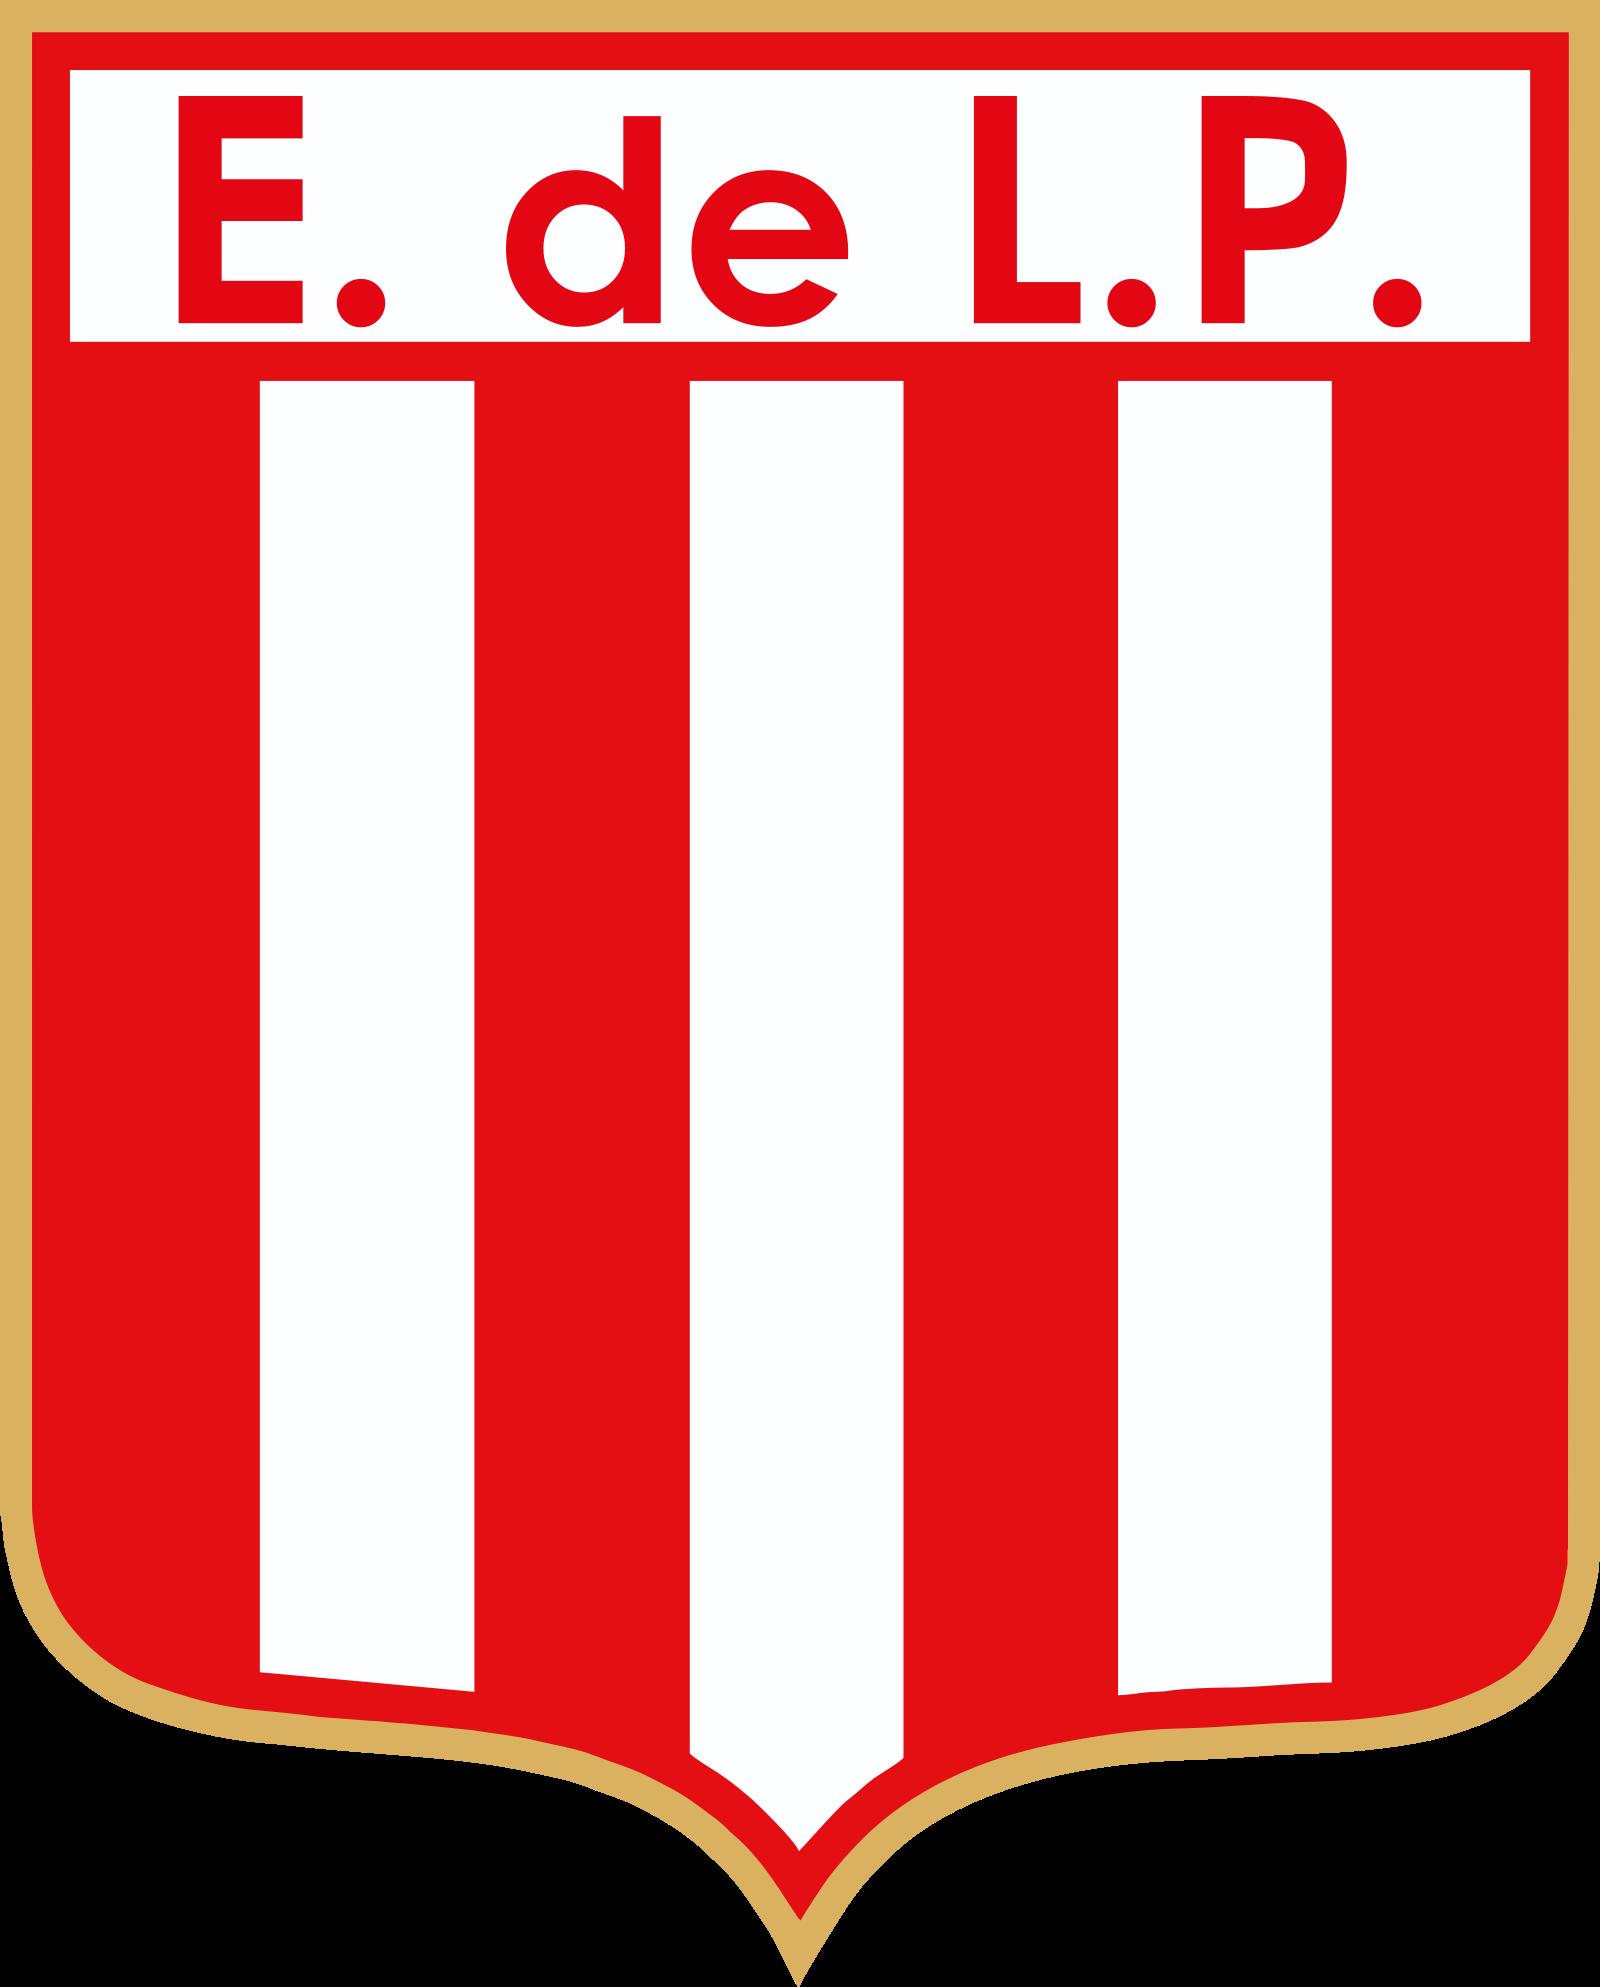 estudiantes logo escudo 4 - Estudiantes de La Plata Logo - Escudo